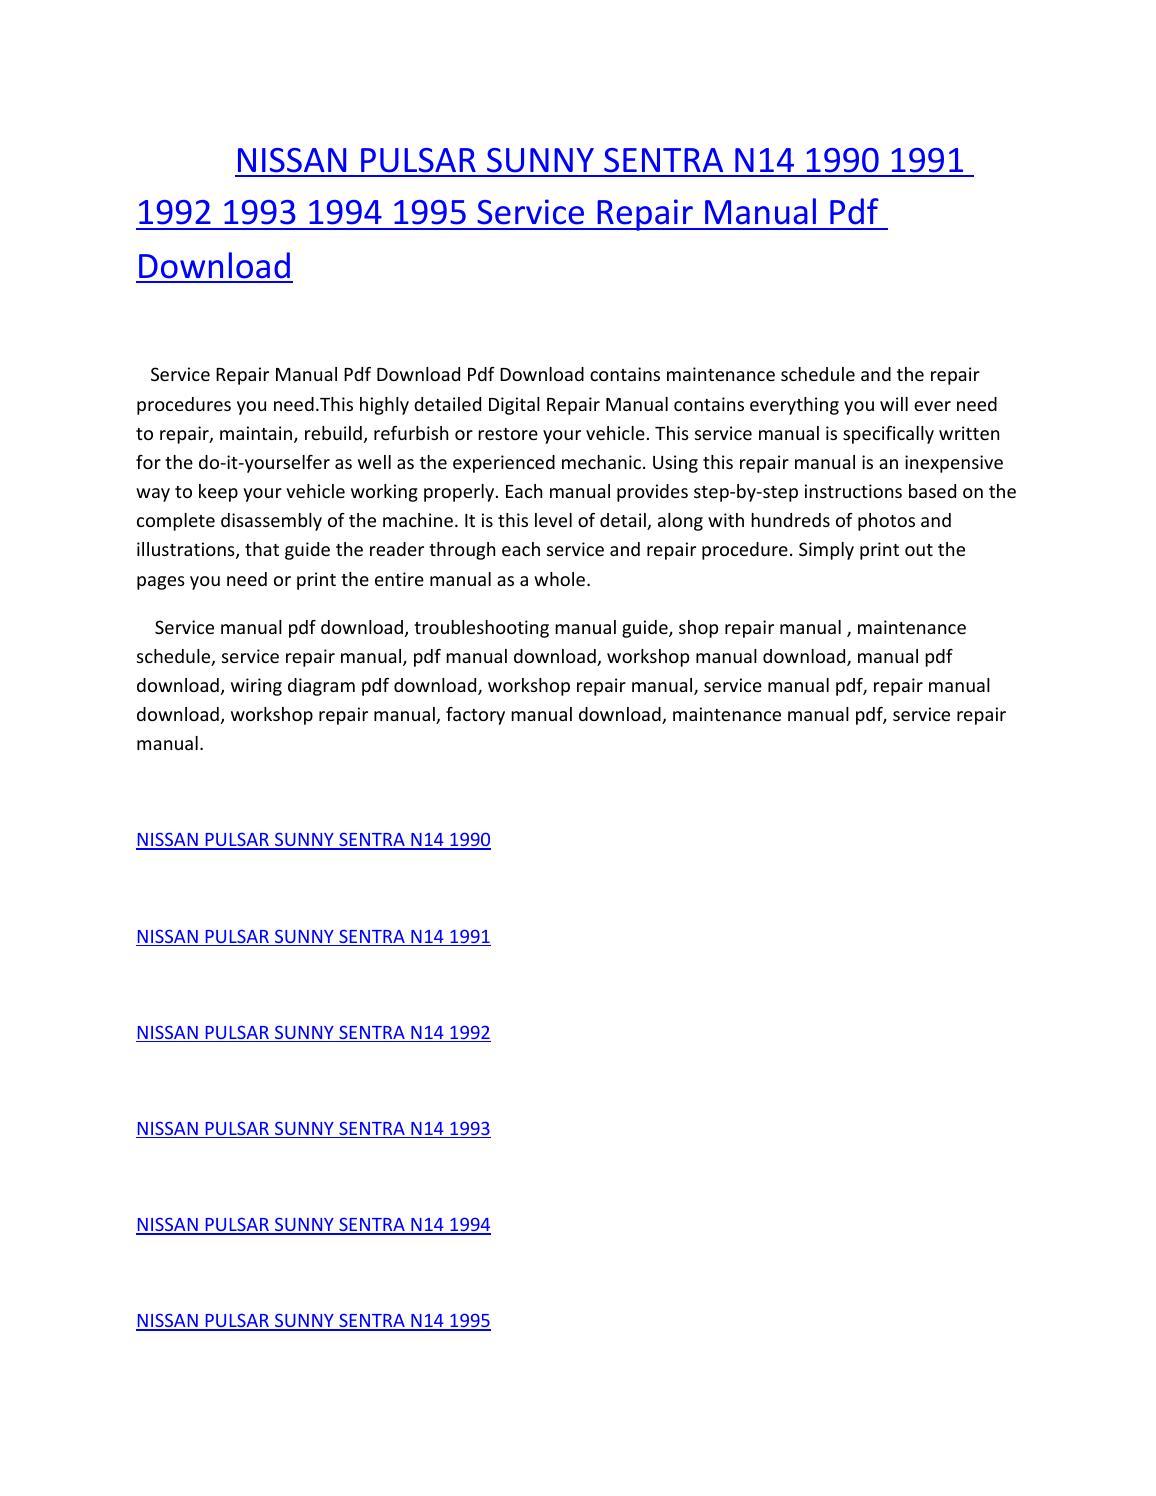 nissan sentra service manual timing chain Array - gobookee 2007 bmw repair  manual rh signaturepedagogies org uk